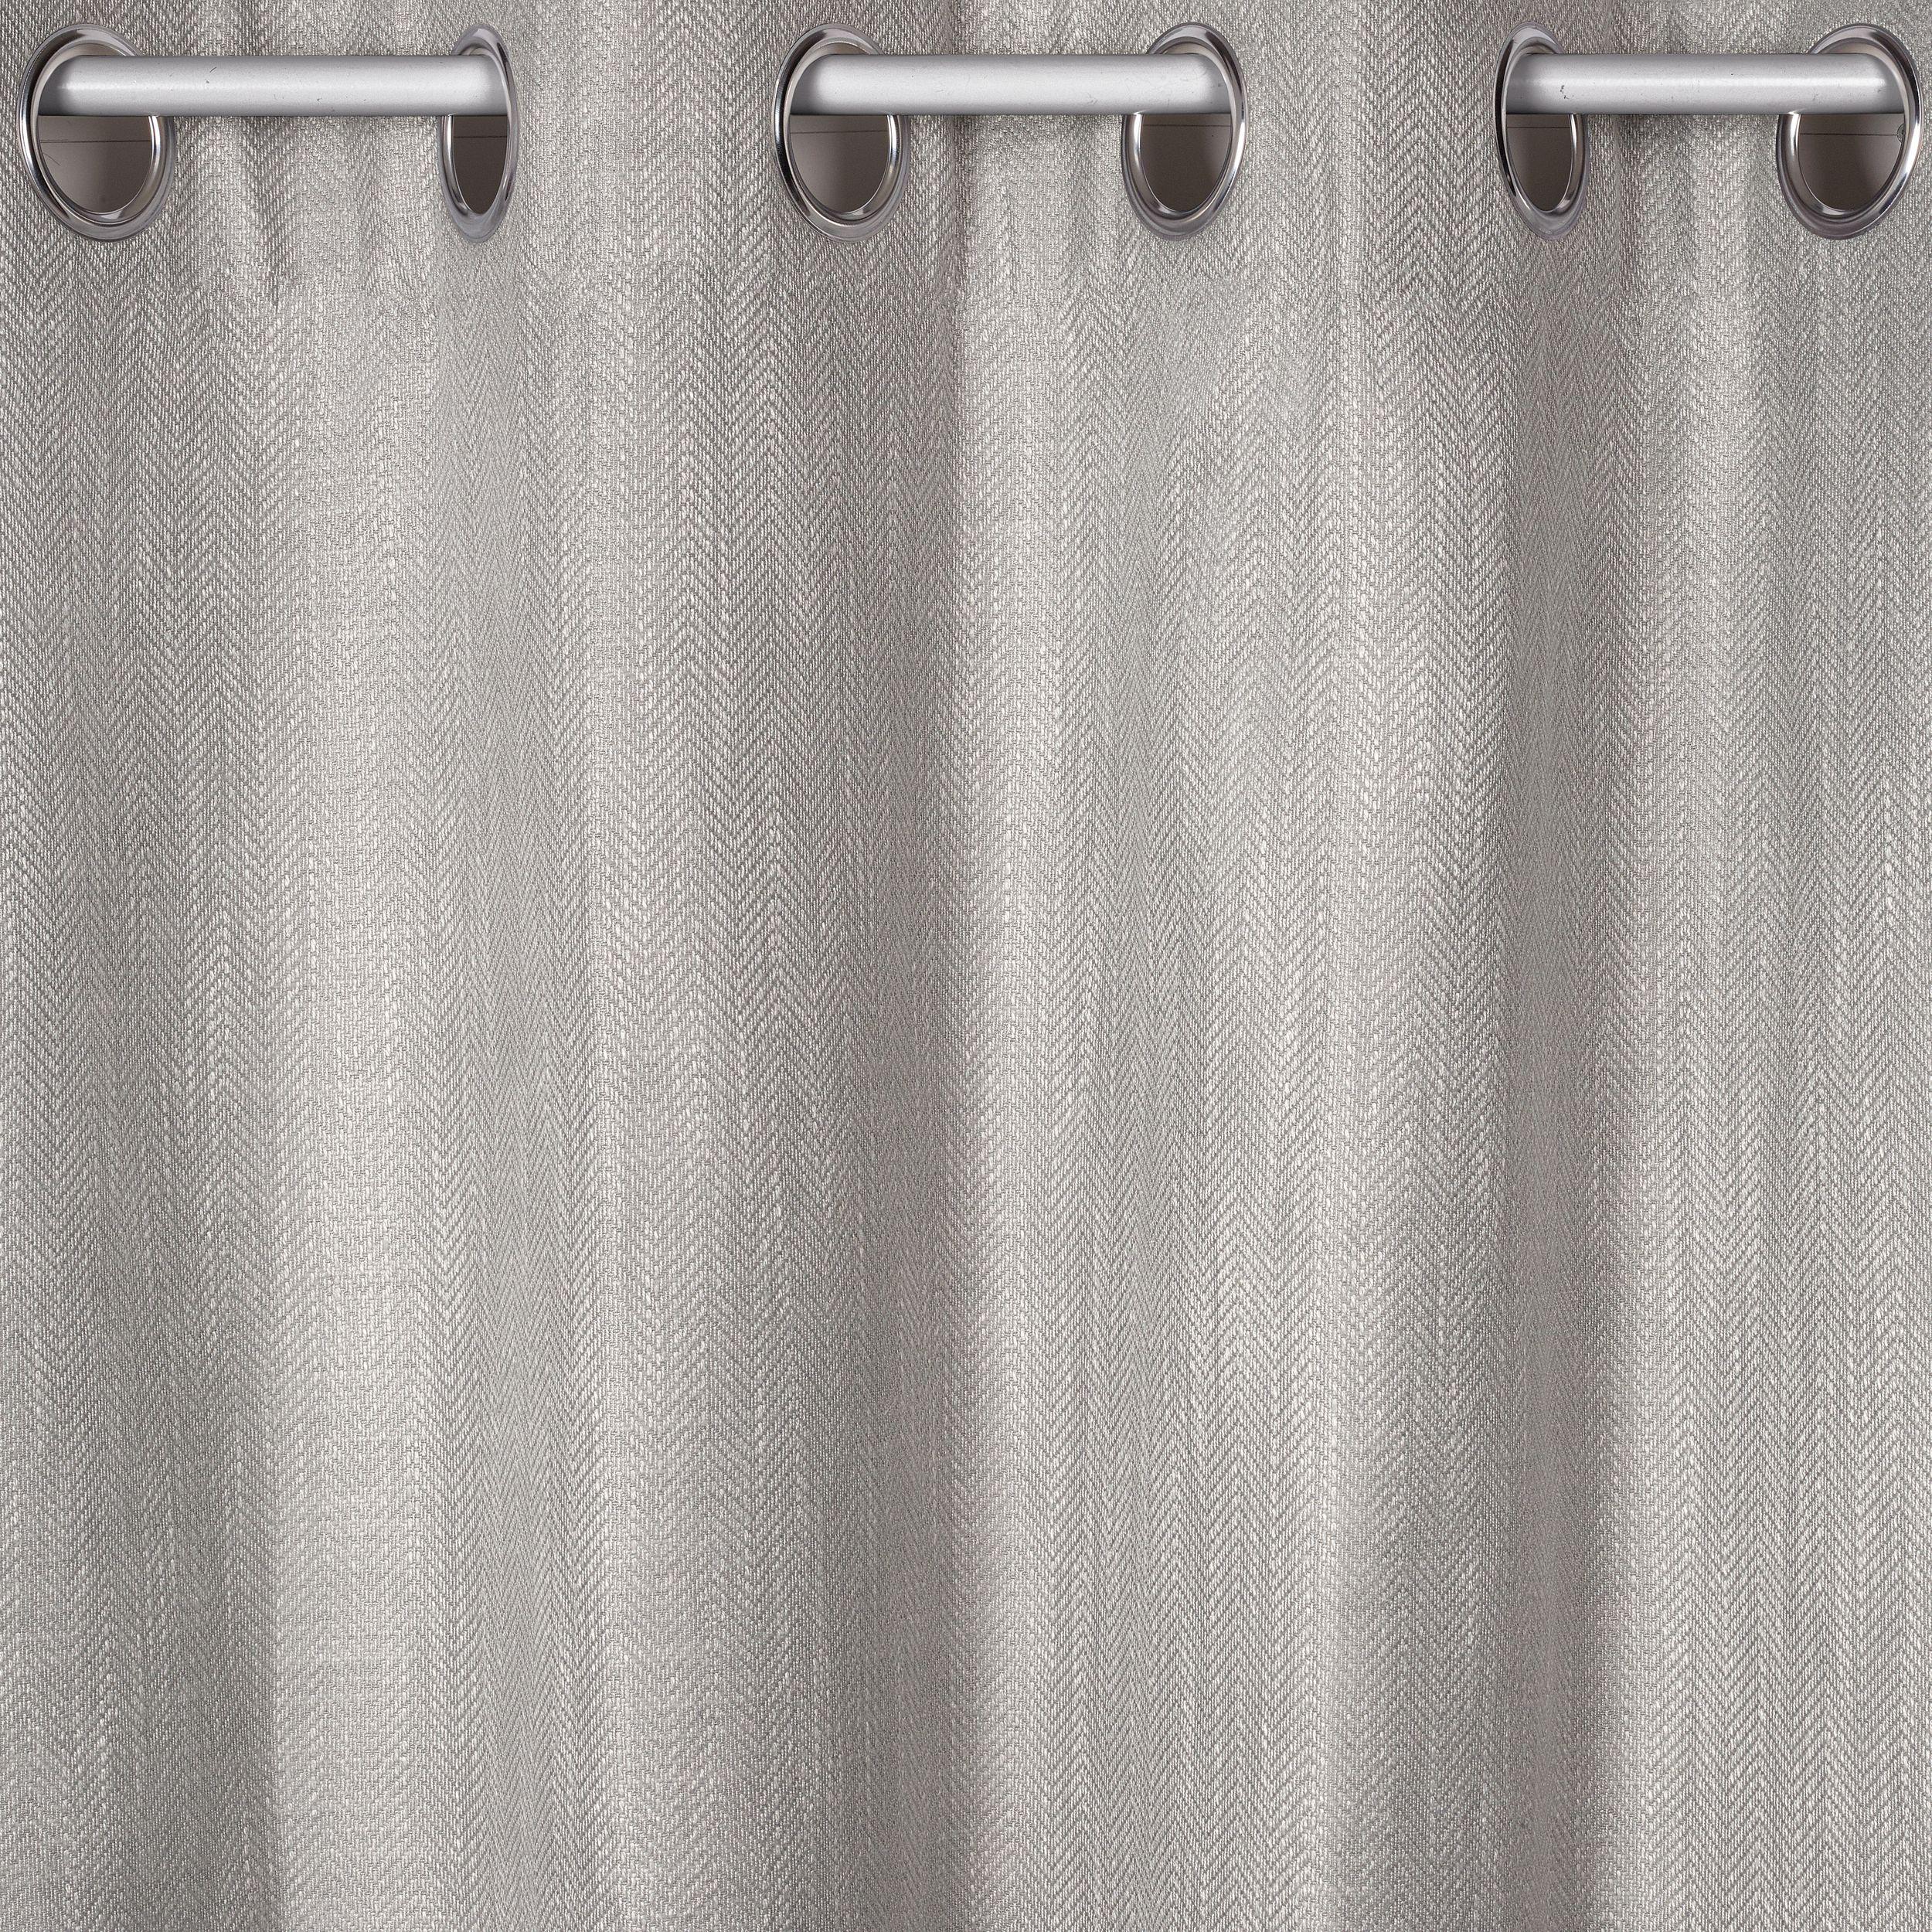 curtain semi sheer curtains pdp gray joss linen panels treatments pocket natalie solid main window reviews rod natural